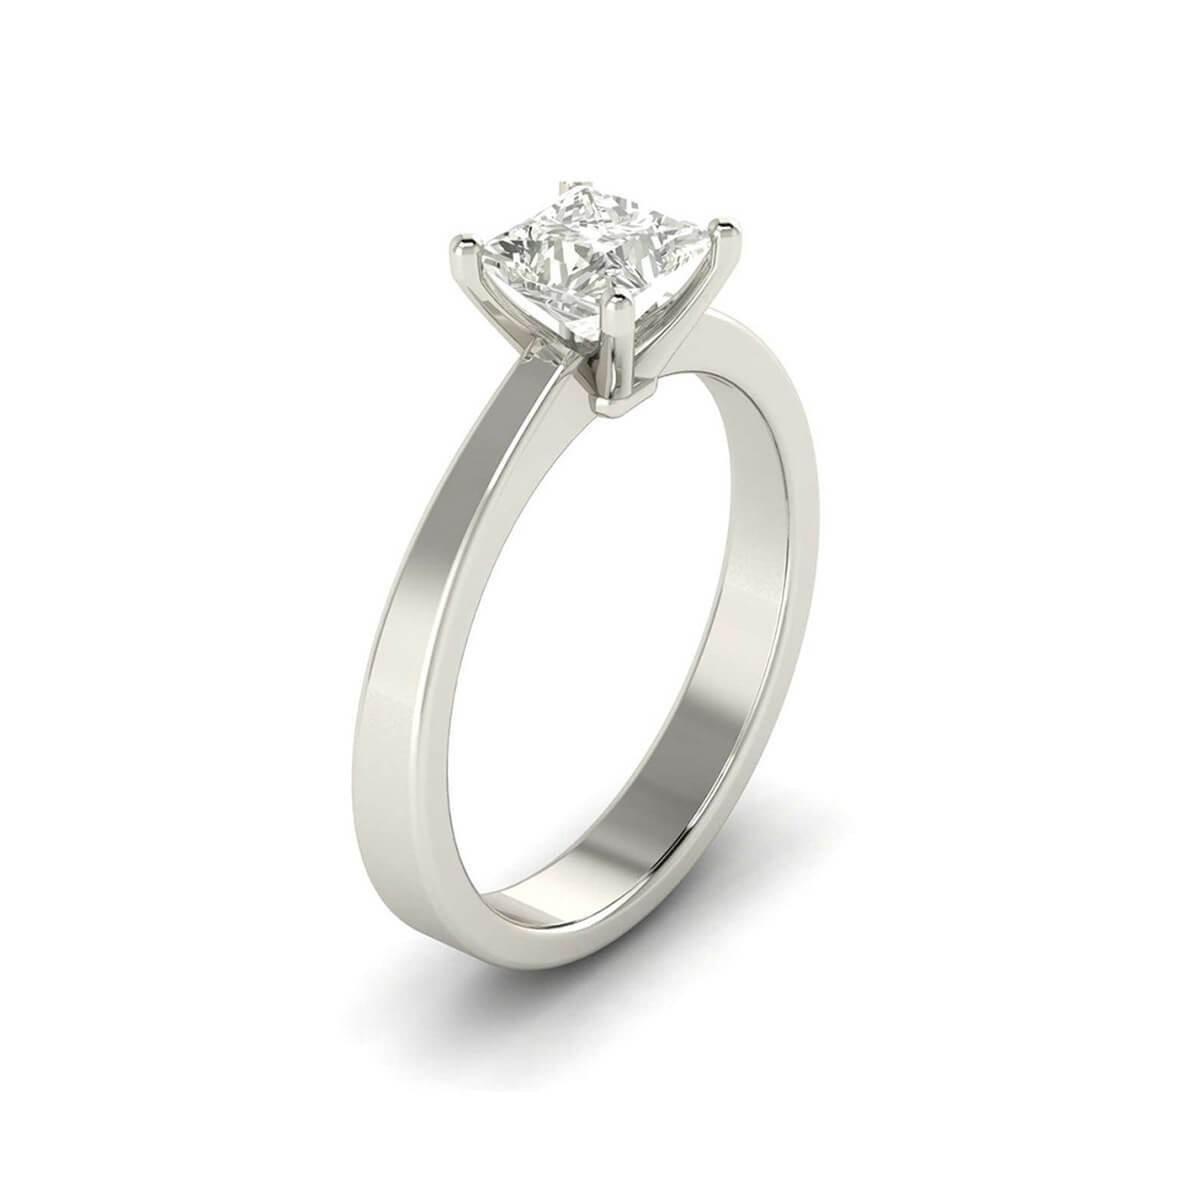 Comfort Fit Solitaire Princess Cut Diamond Ring - 5Ine Jewels